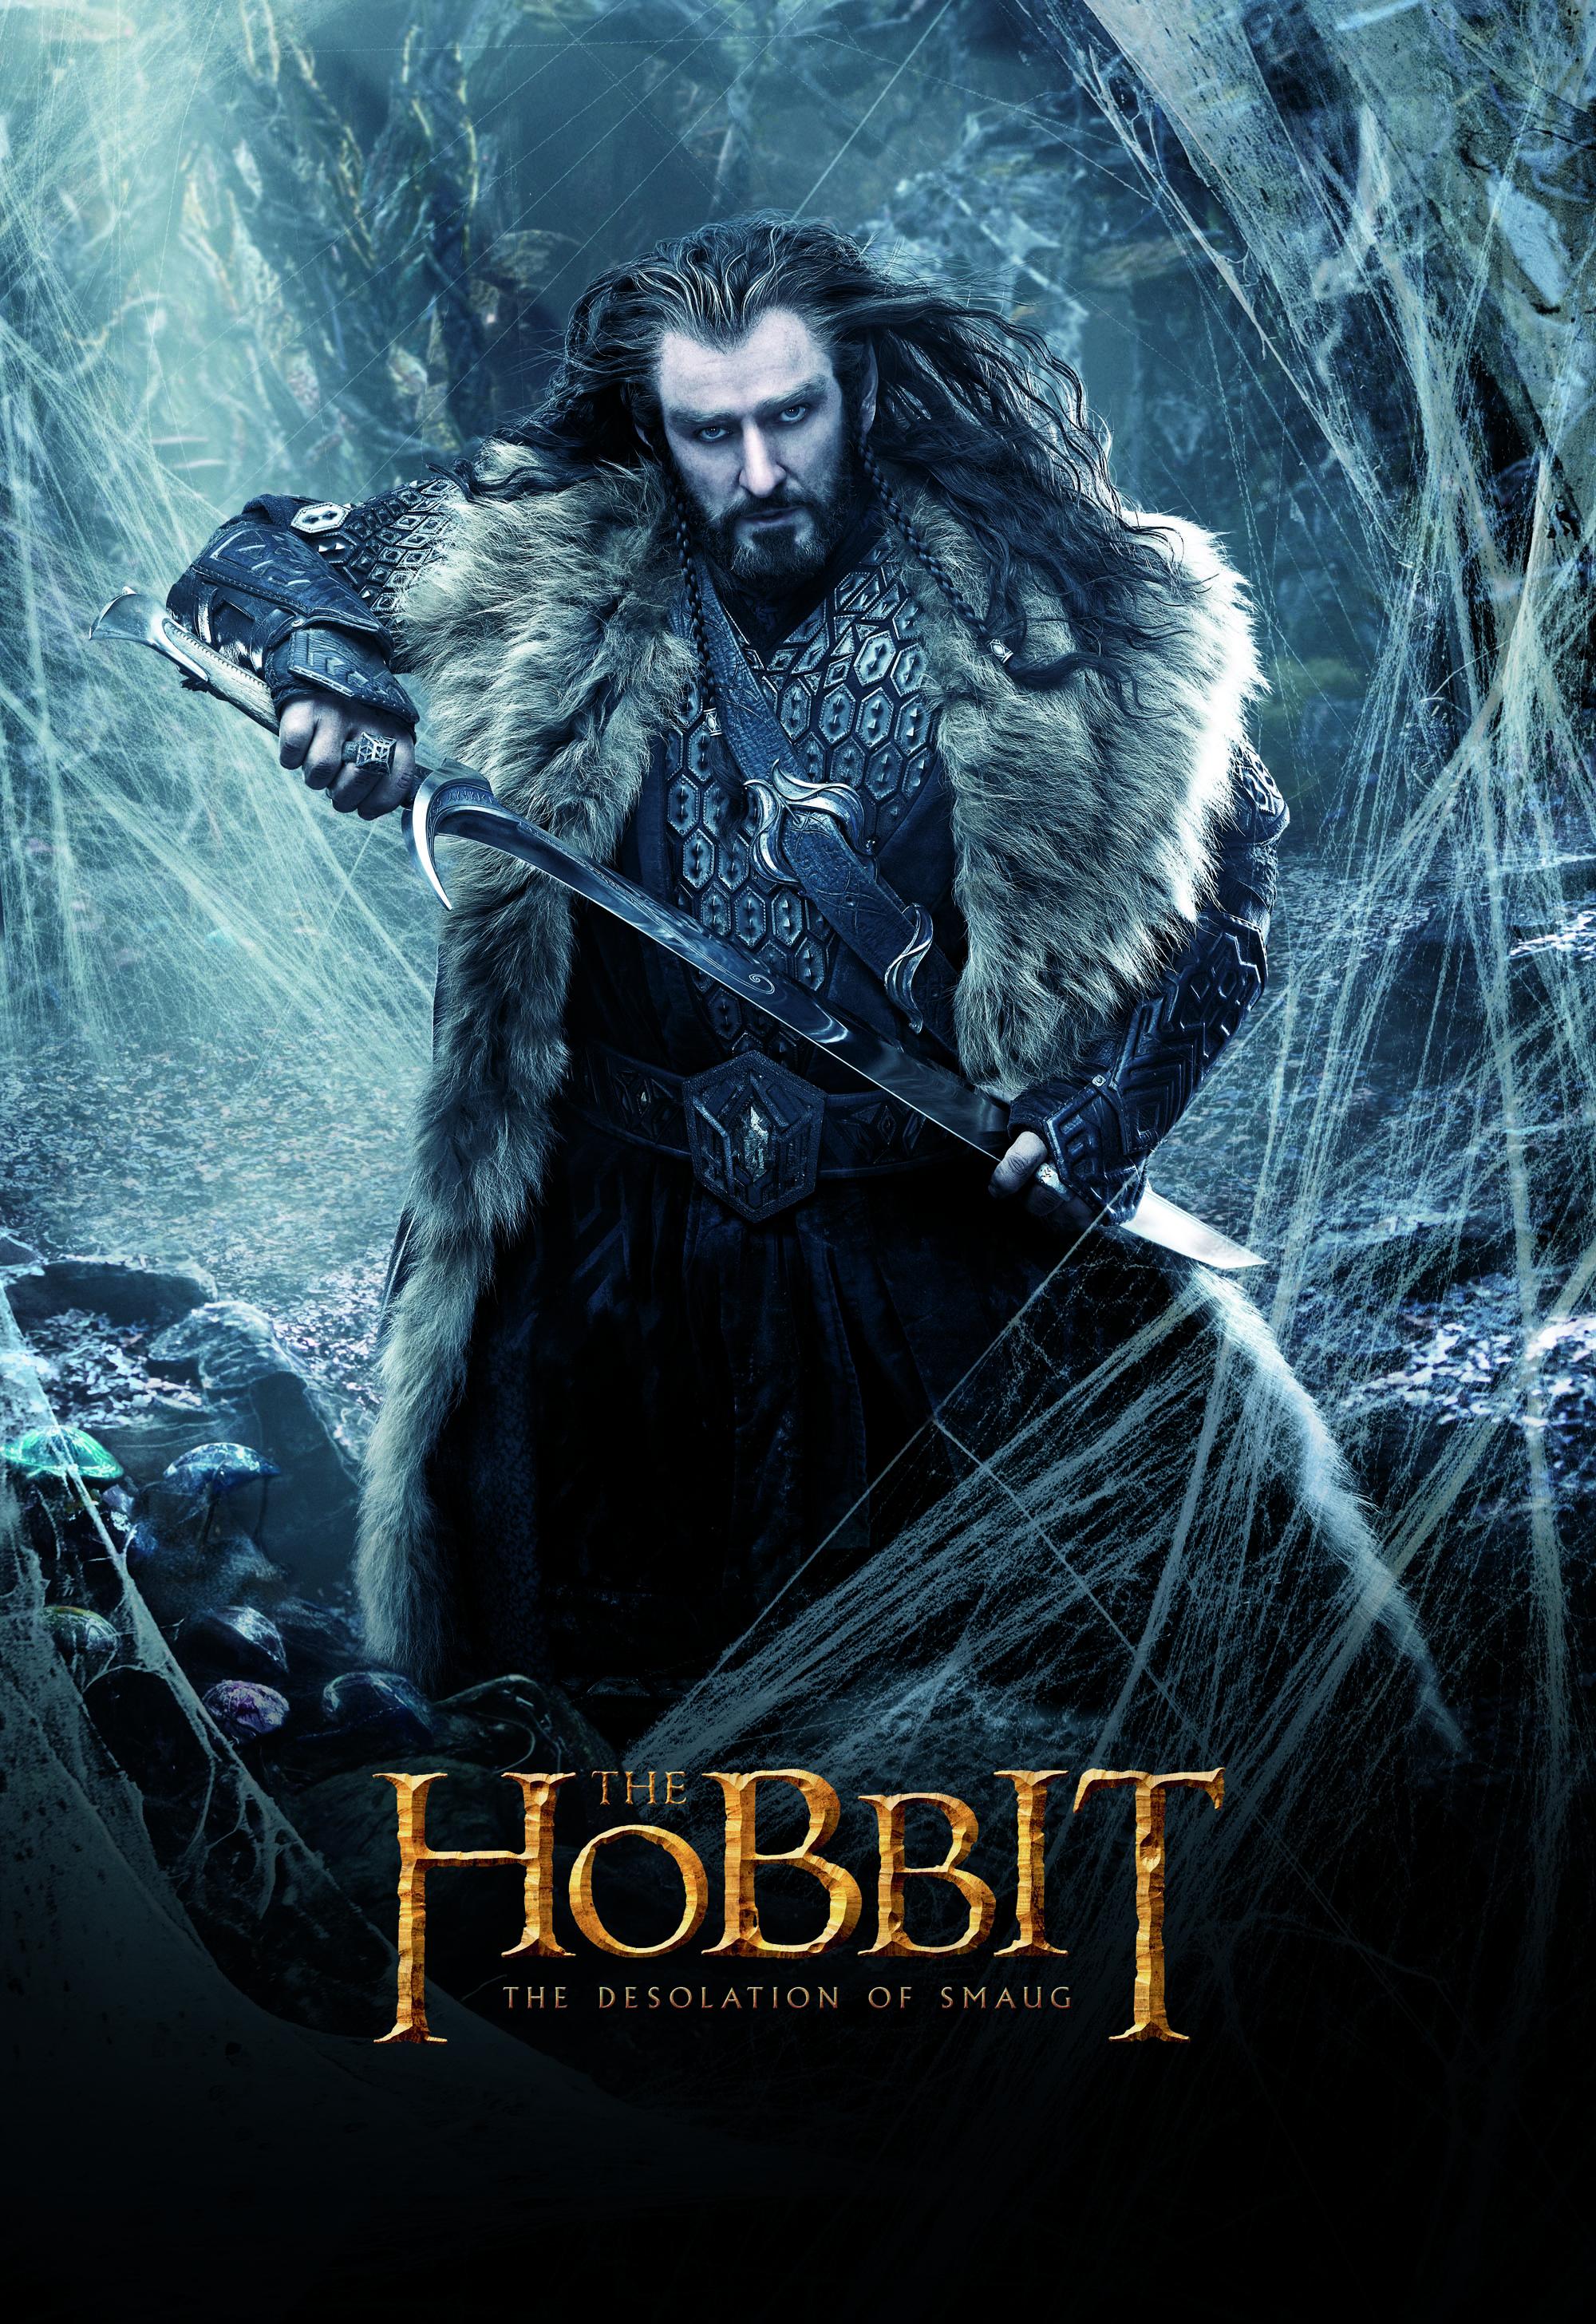 Thorin nouveau poster